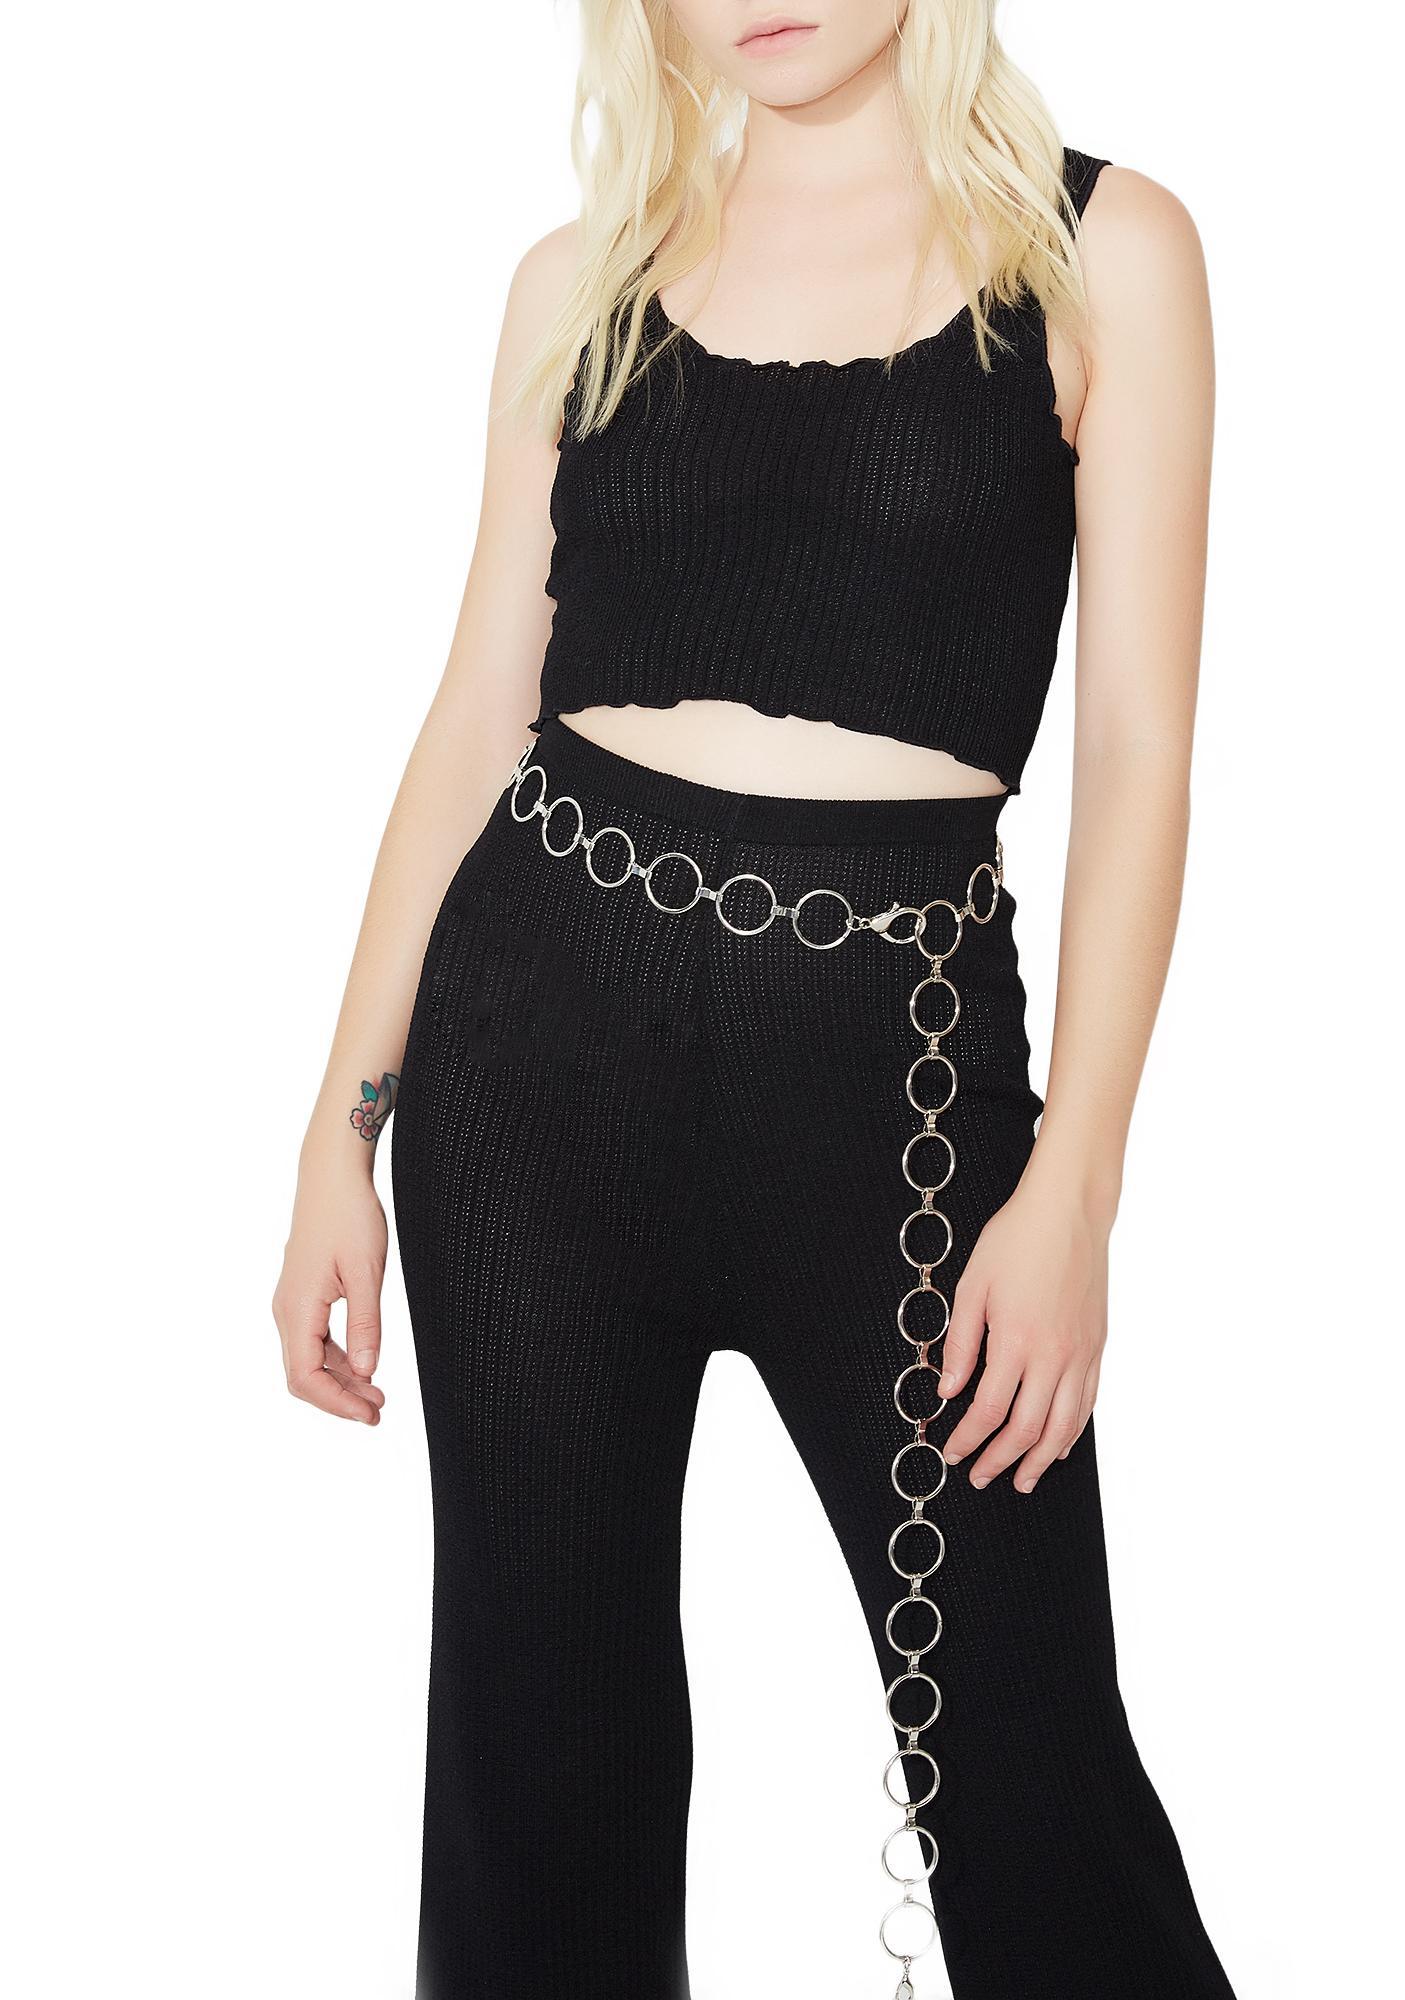 Groovy Baby Chain Belt